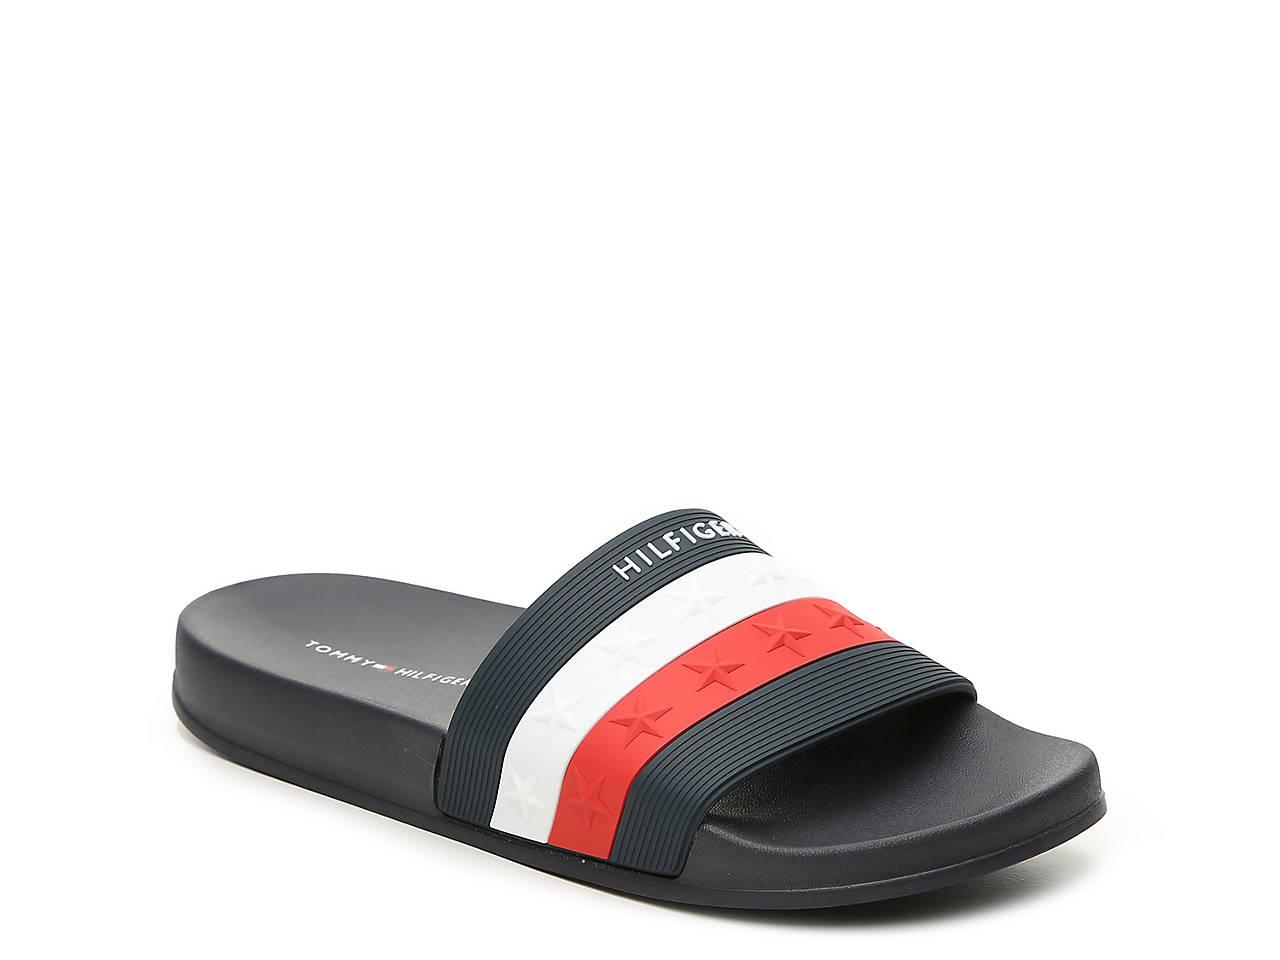 1f759b33a38 Tommy Hilfiger Dulce Slide Sandal - Women s Men s Shoes